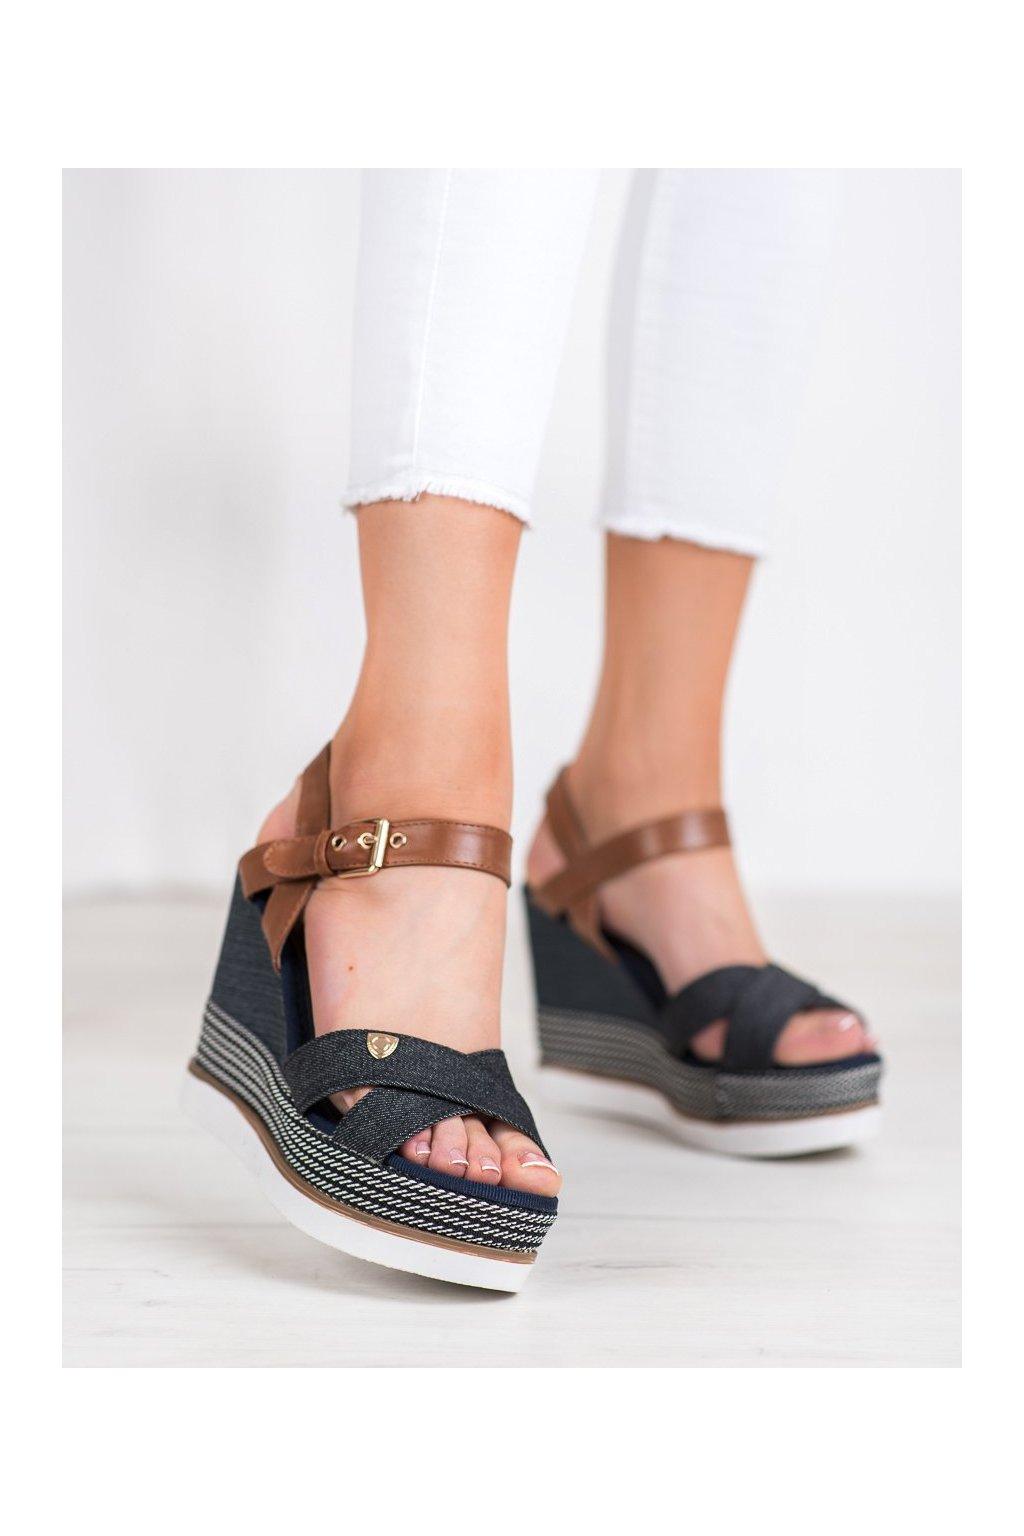 Viacfarebné sandále na platforme Shelovet kod DSHK-3B